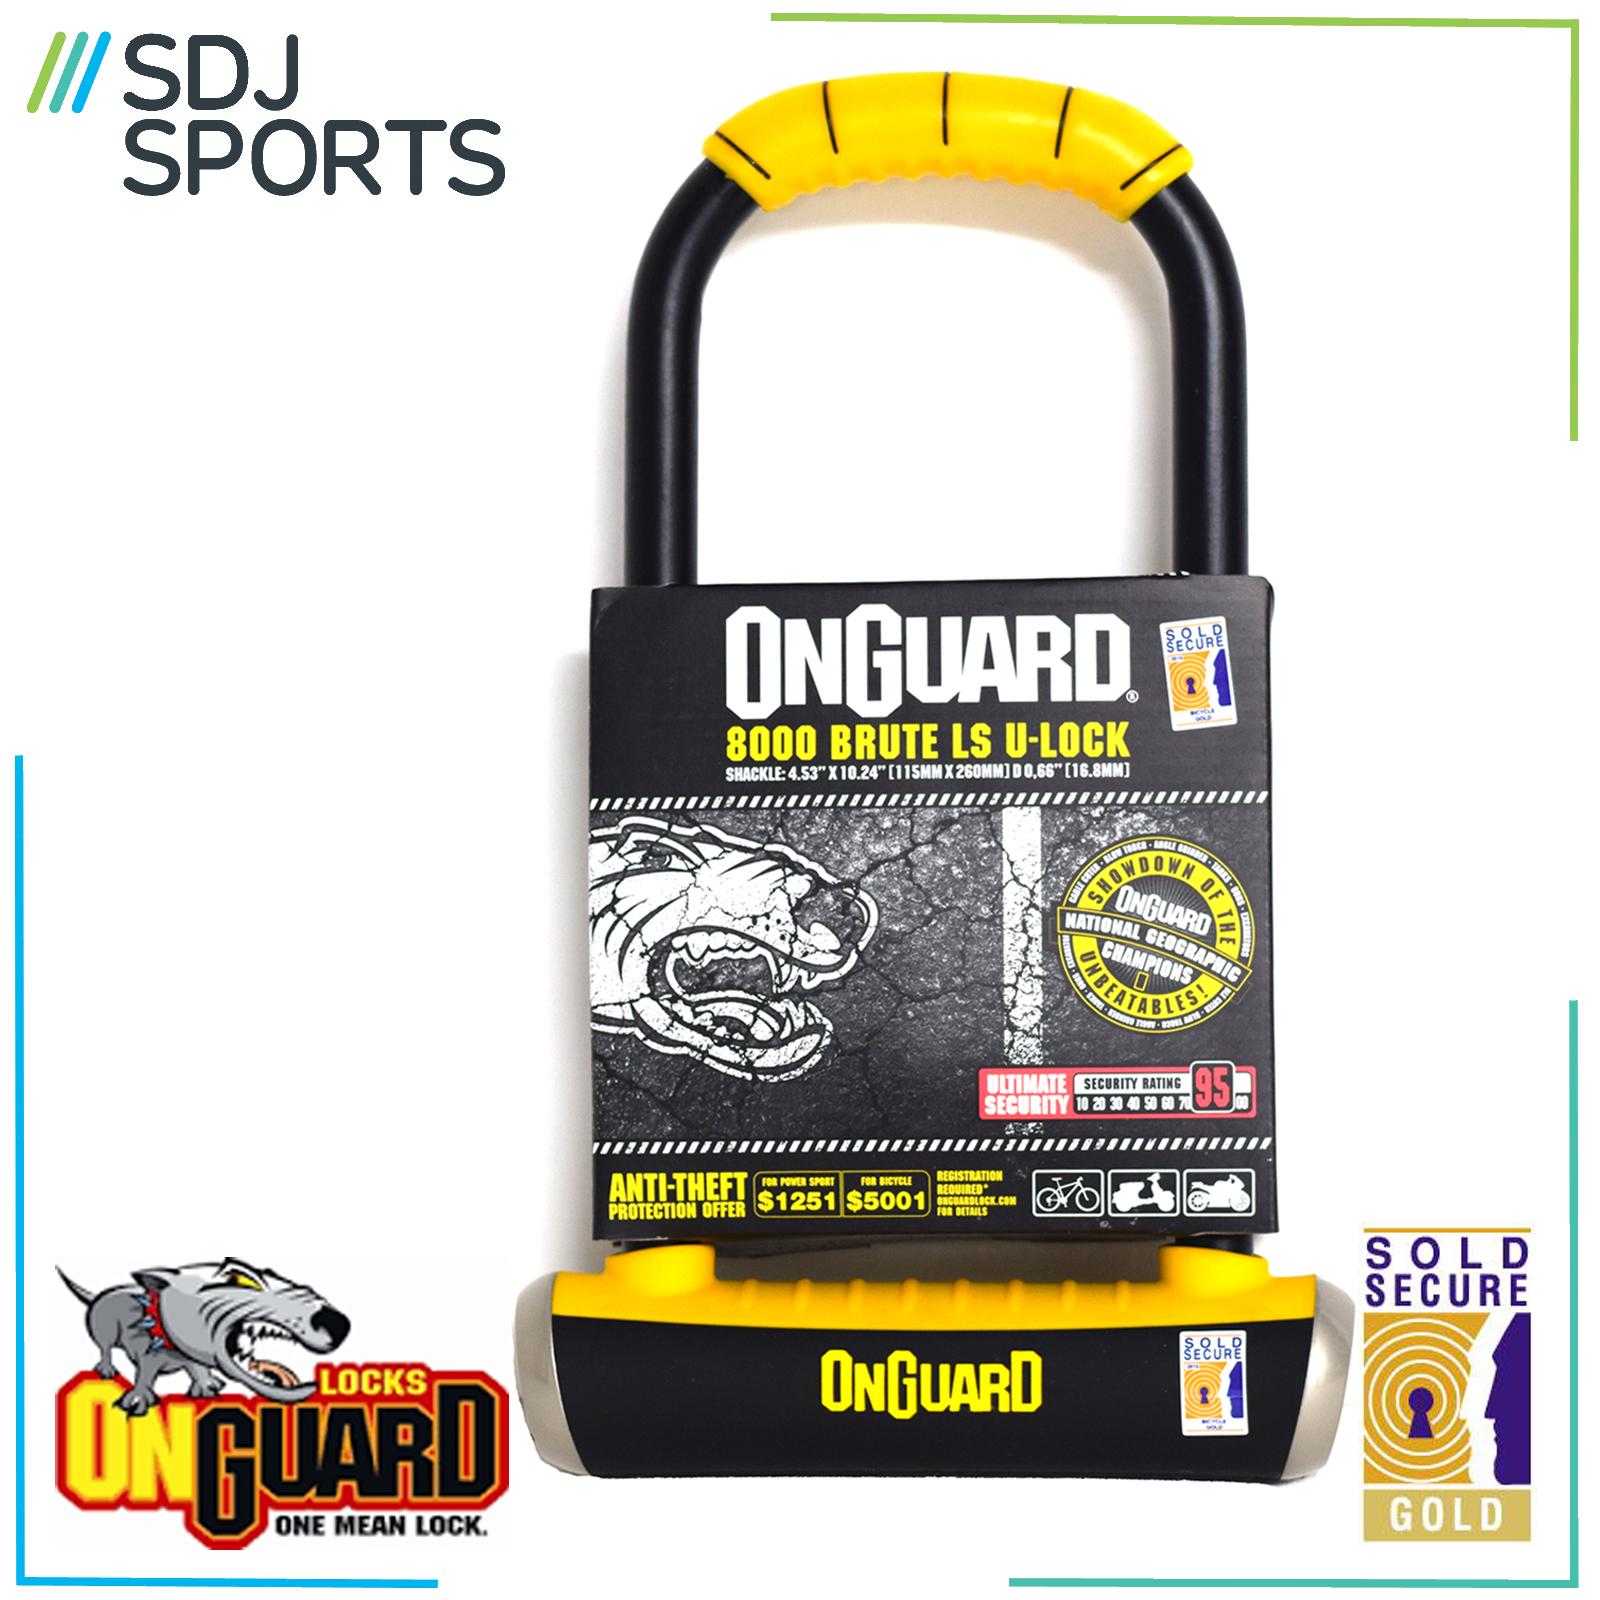 onguard brute ls 8000 u lock bike security d shackle cycle gold sold secure. Black Bedroom Furniture Sets. Home Design Ideas